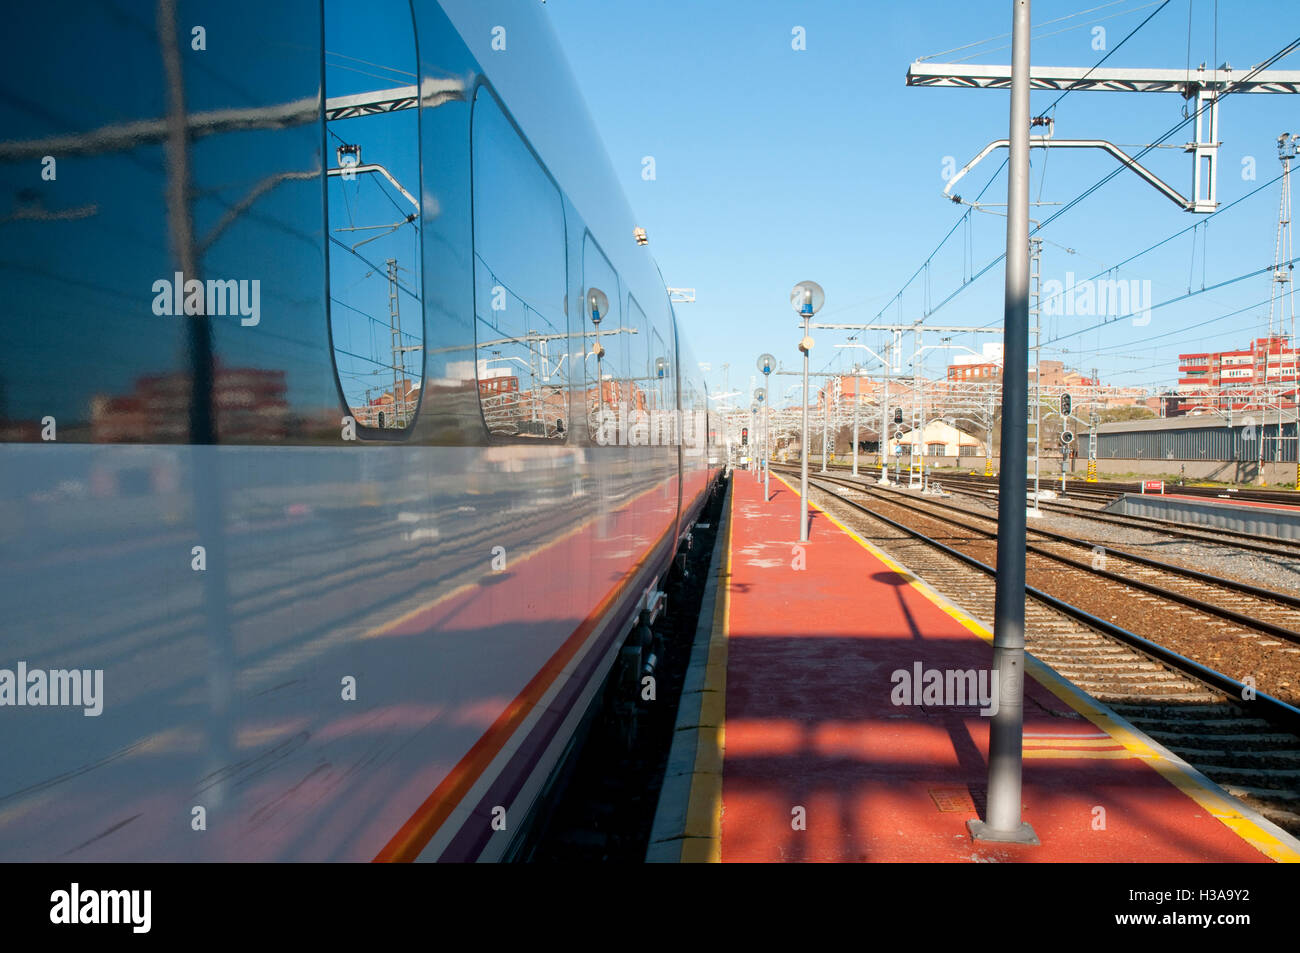 Platform and train. Campo Grande Railway Station, Valladolid, Castilla Leon, Spain. - Stock Image